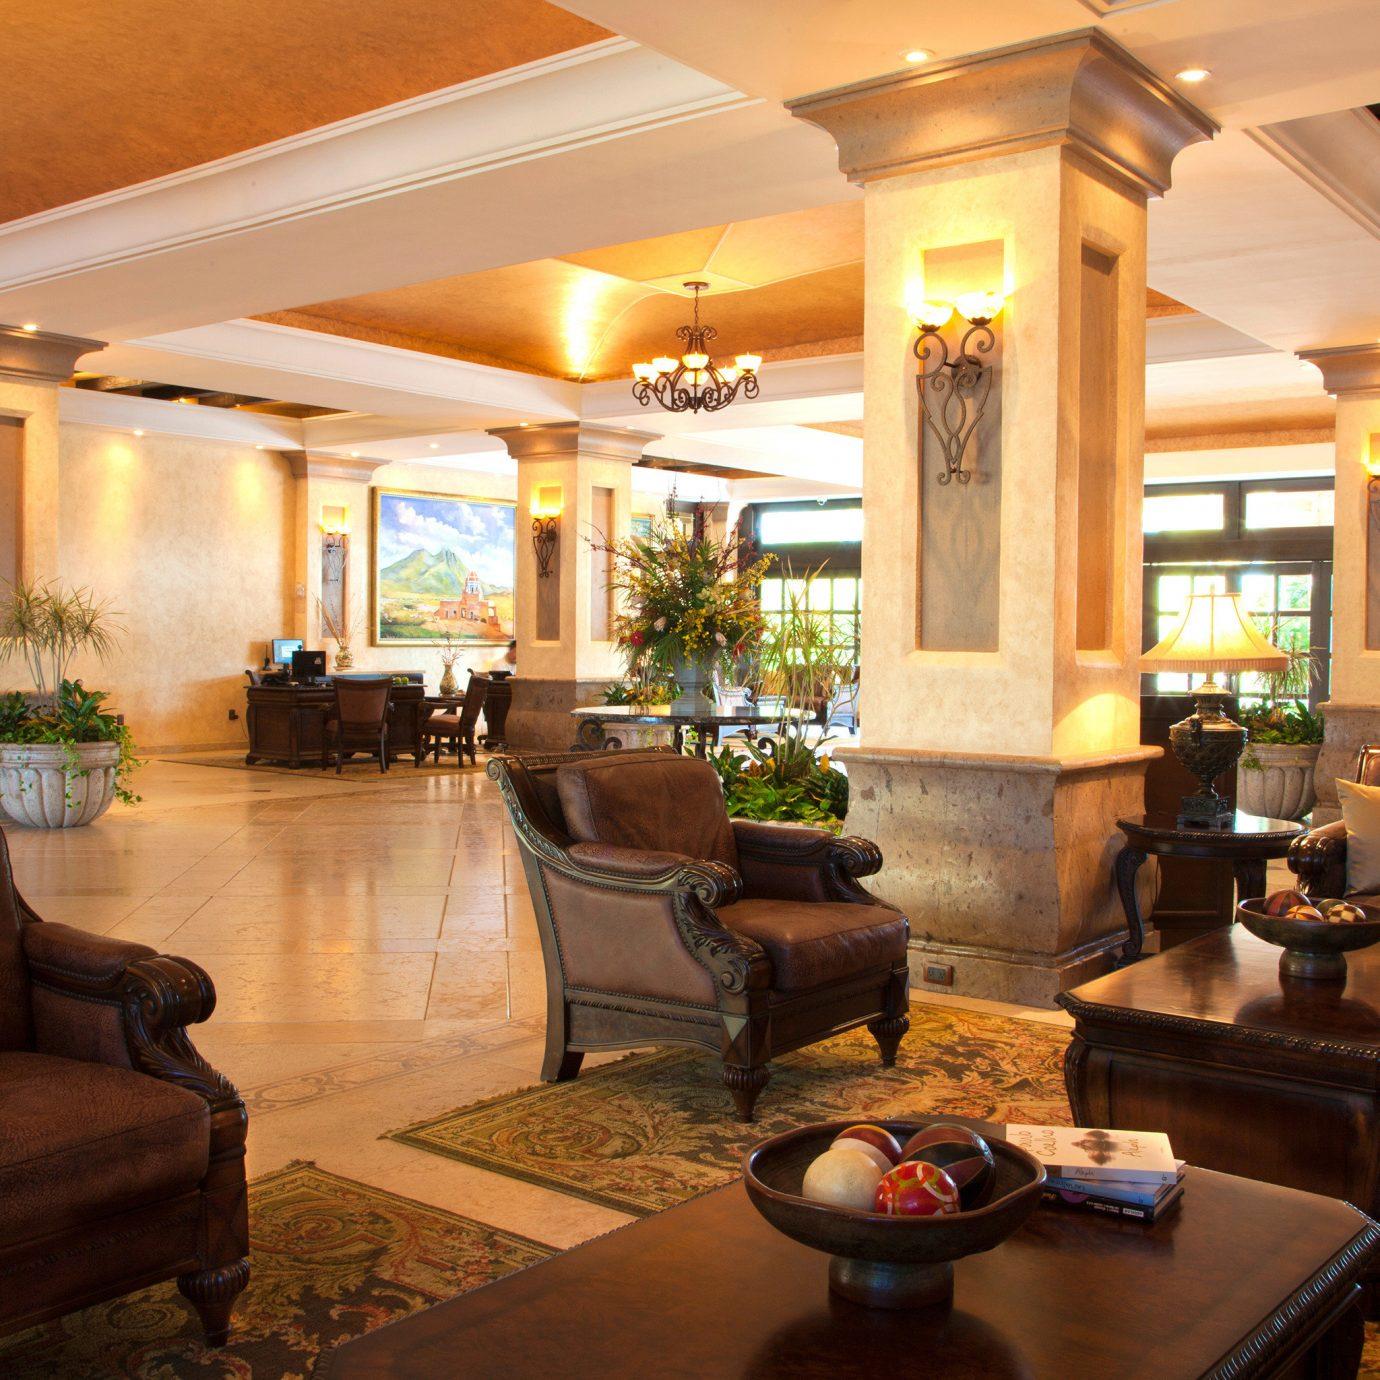 sofa Lobby property living room home Fireplace condominium Resort mansion Villa leather